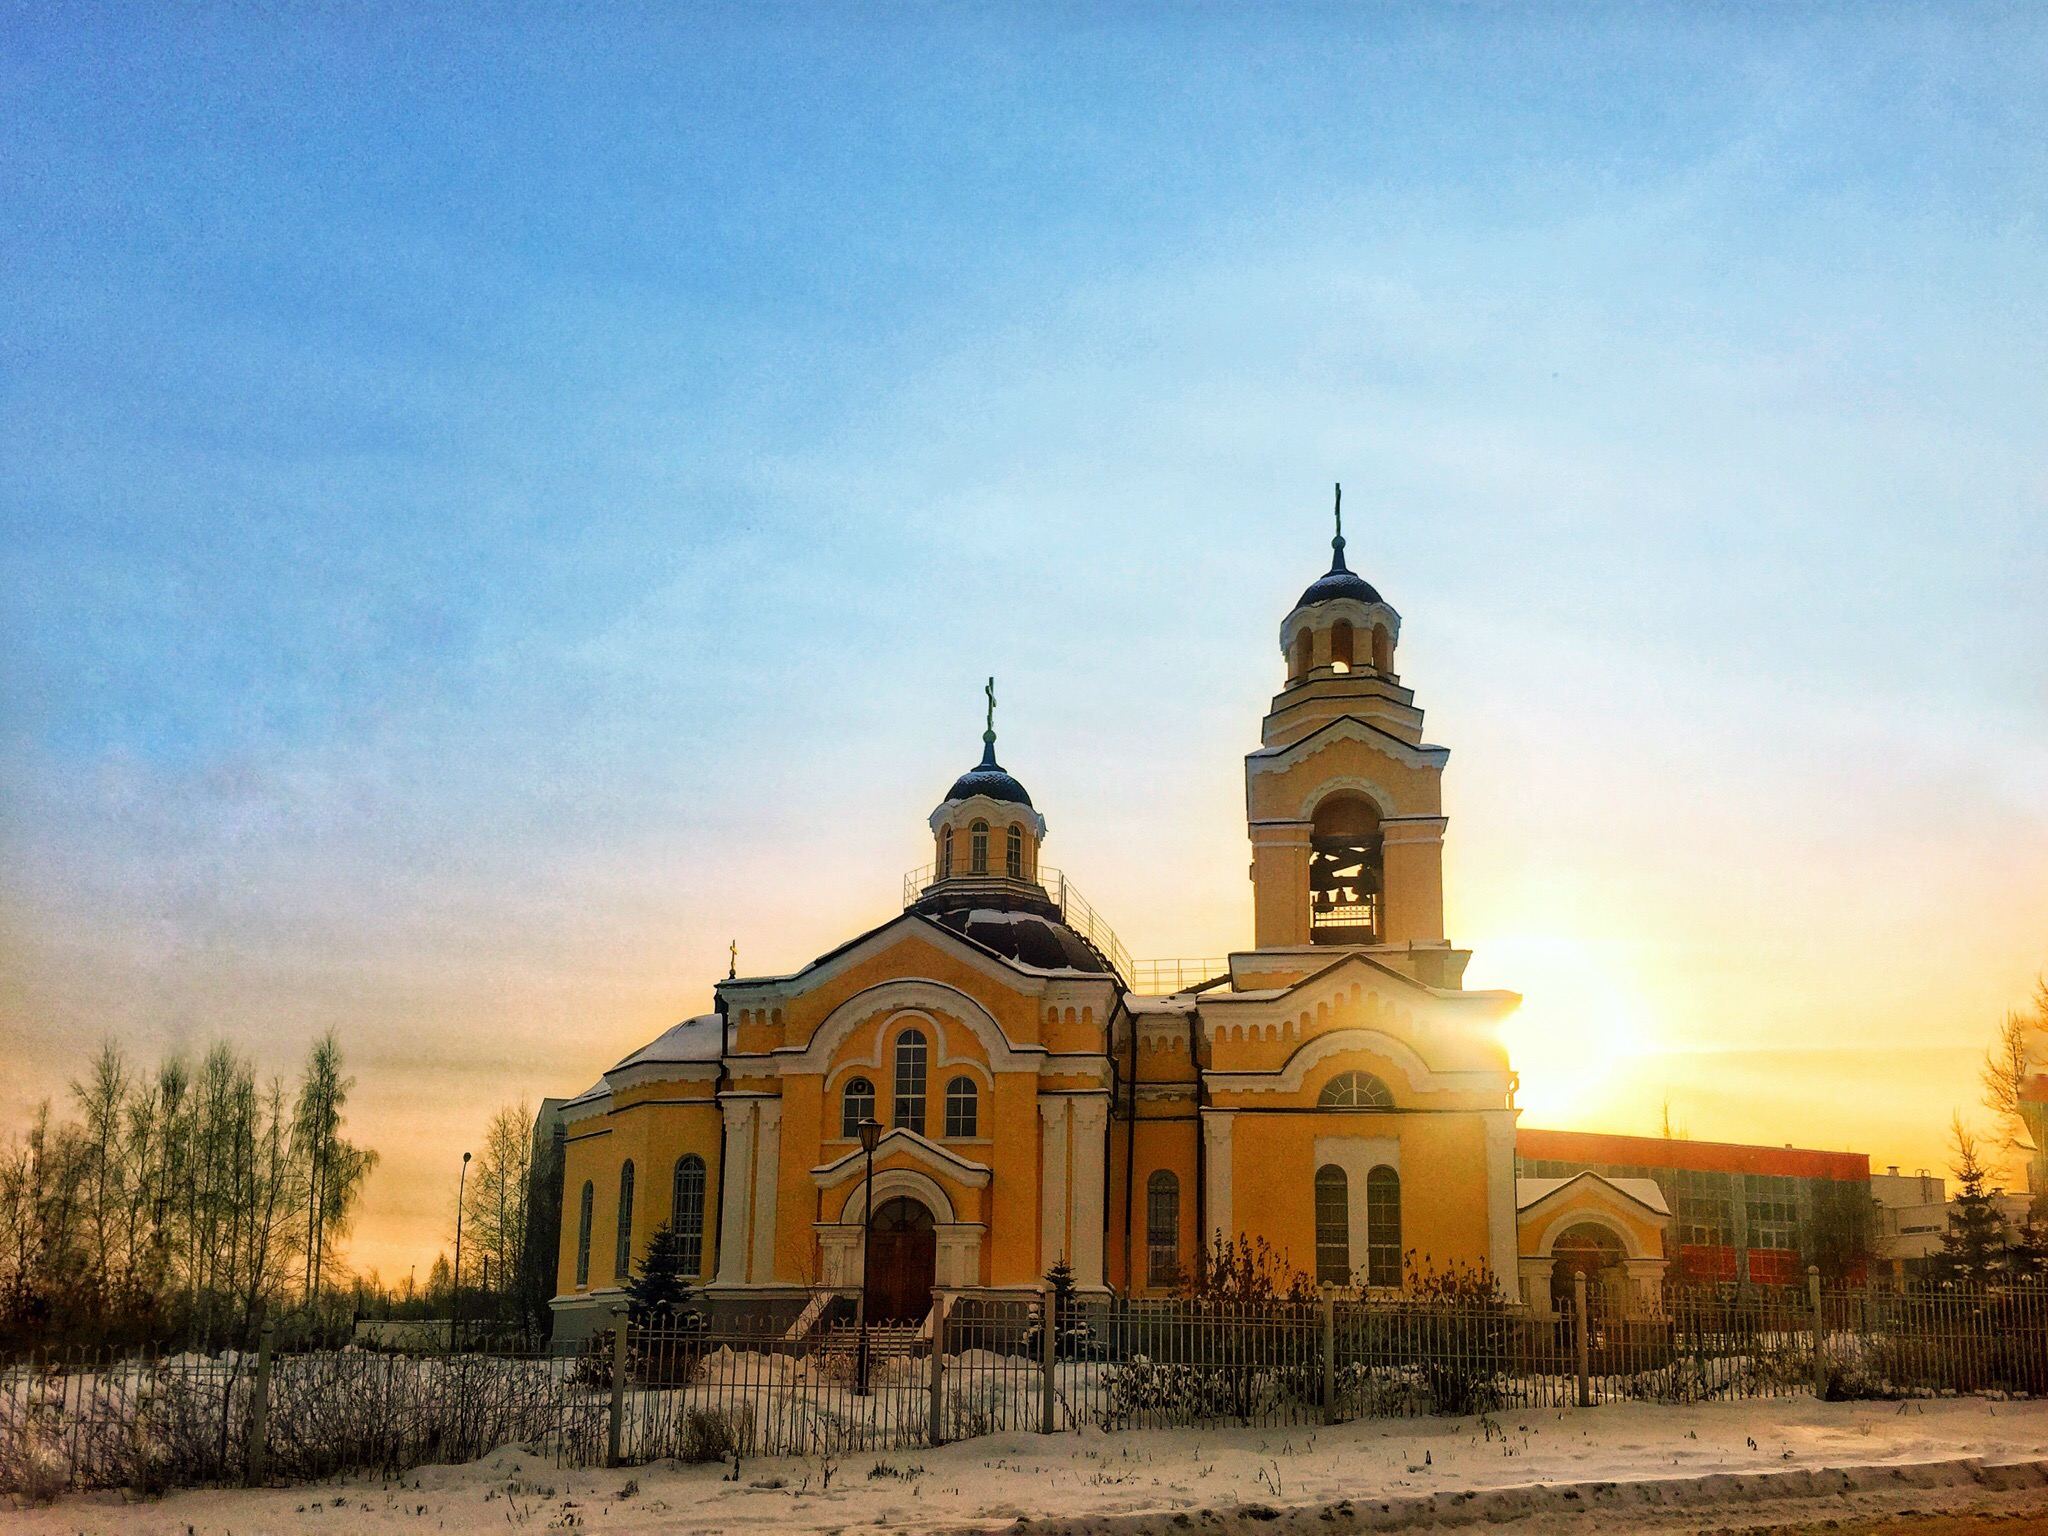 Кировград: храм святого преподобного Амвросия Оптинского